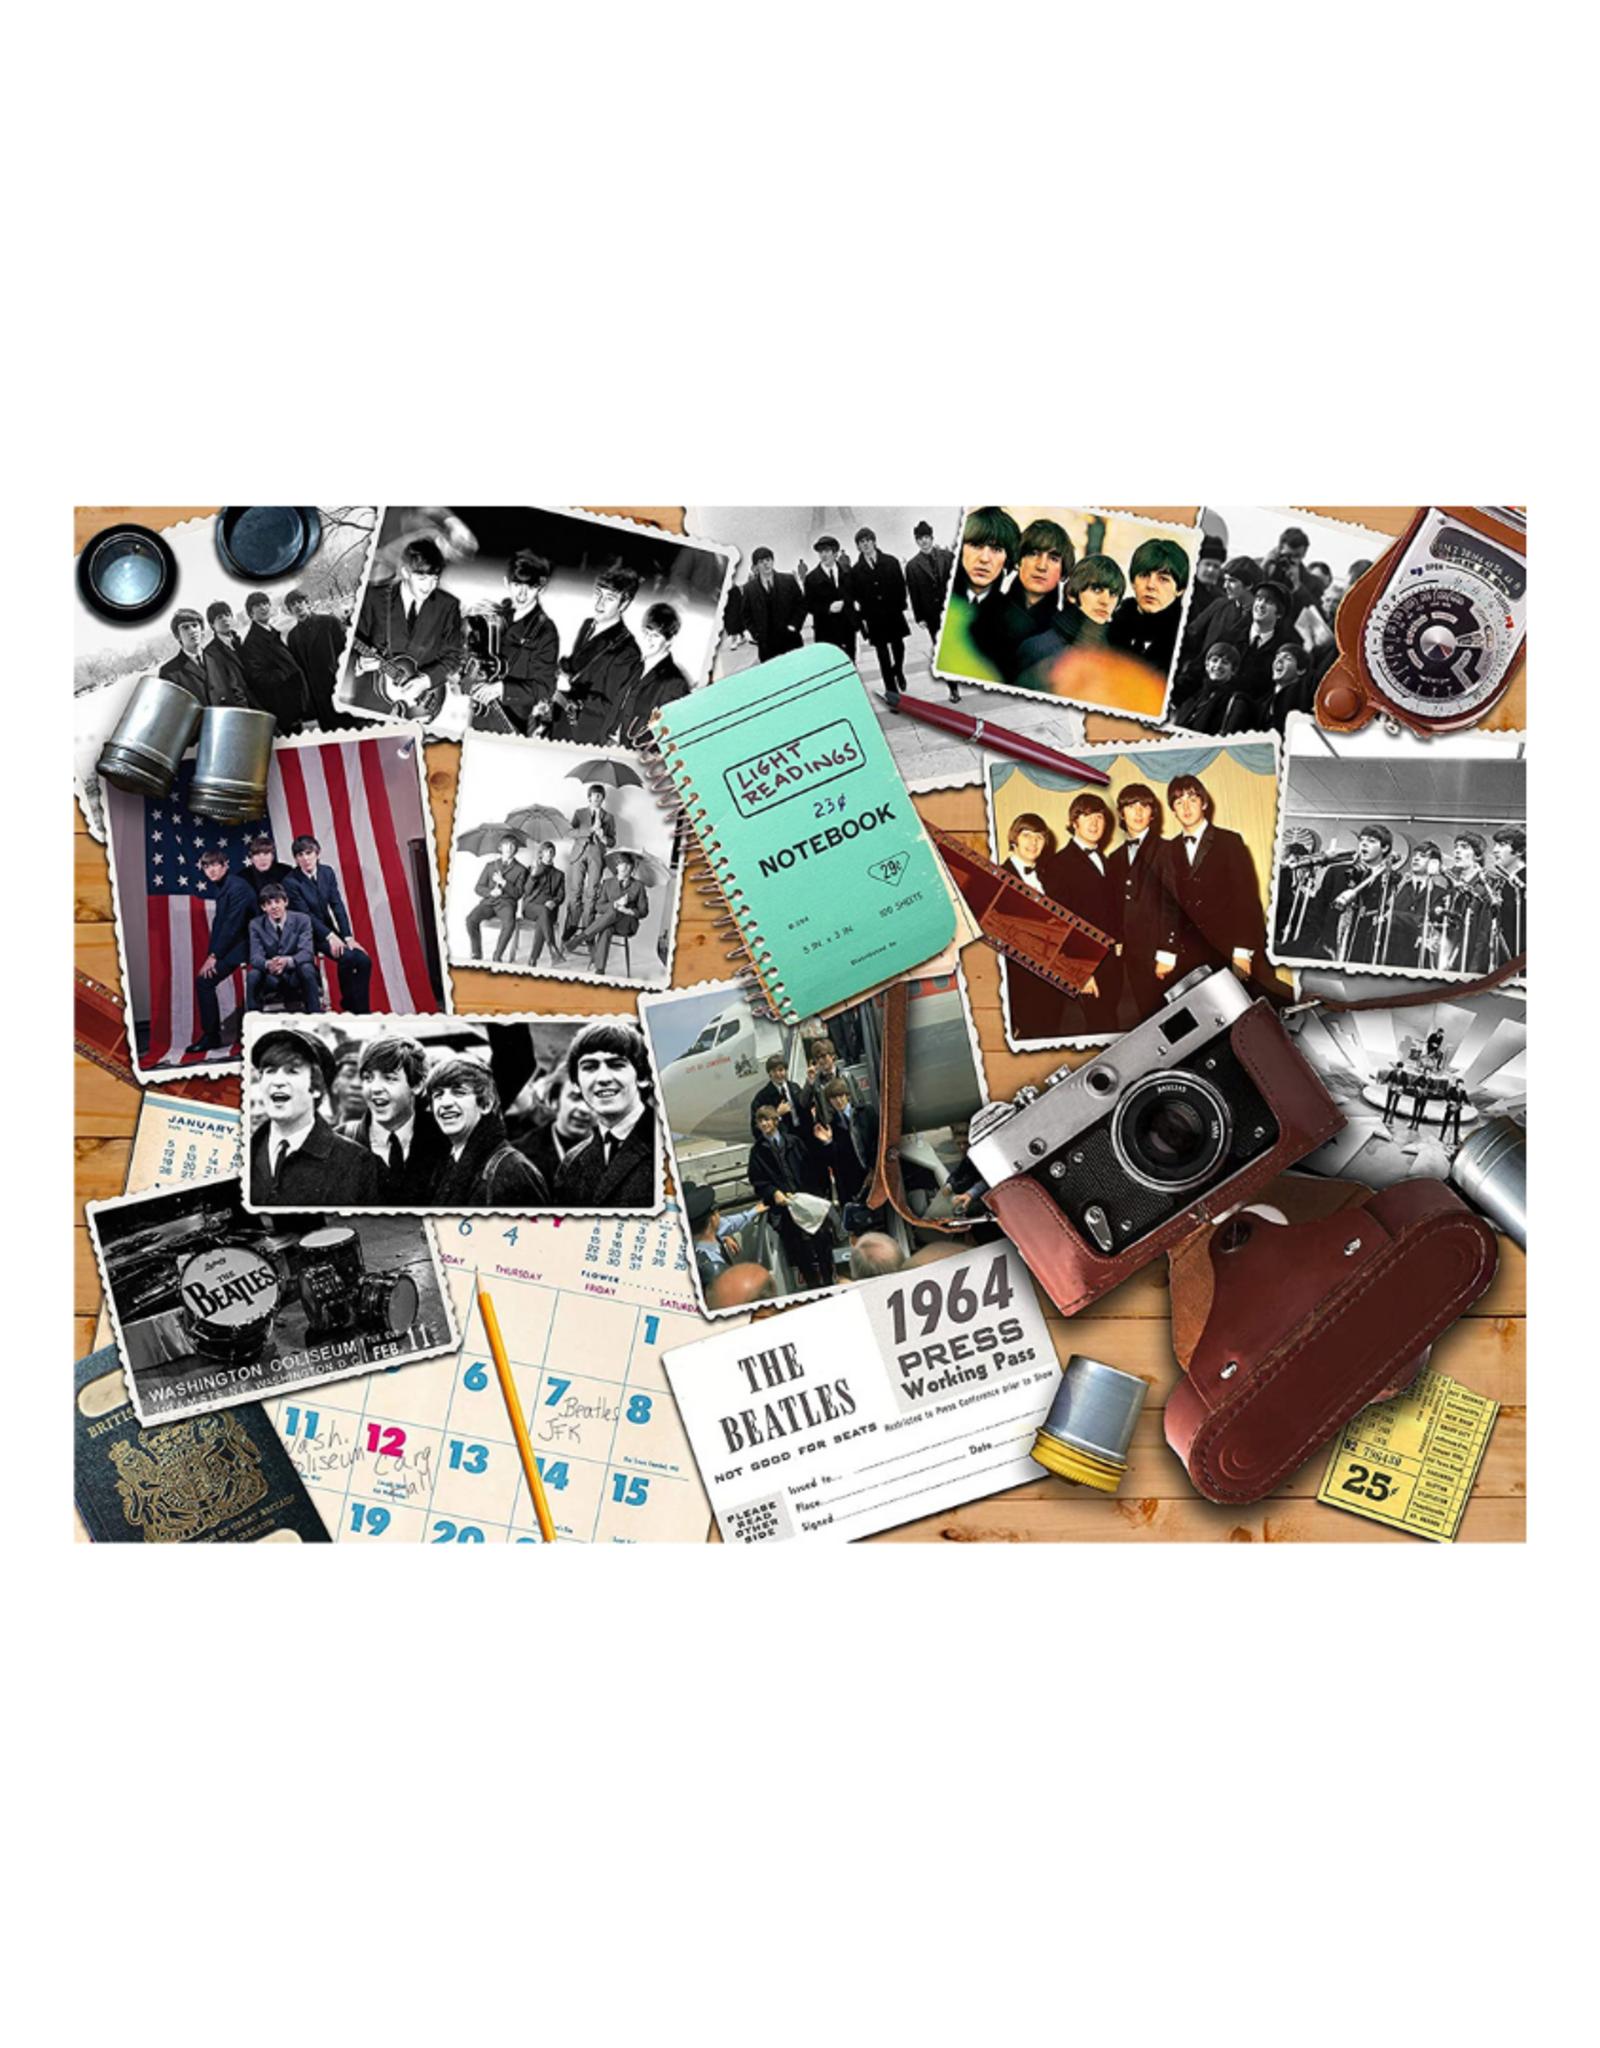 Ravensburger The Beatles 1964: A Photographer's View 1000pc Puzzle